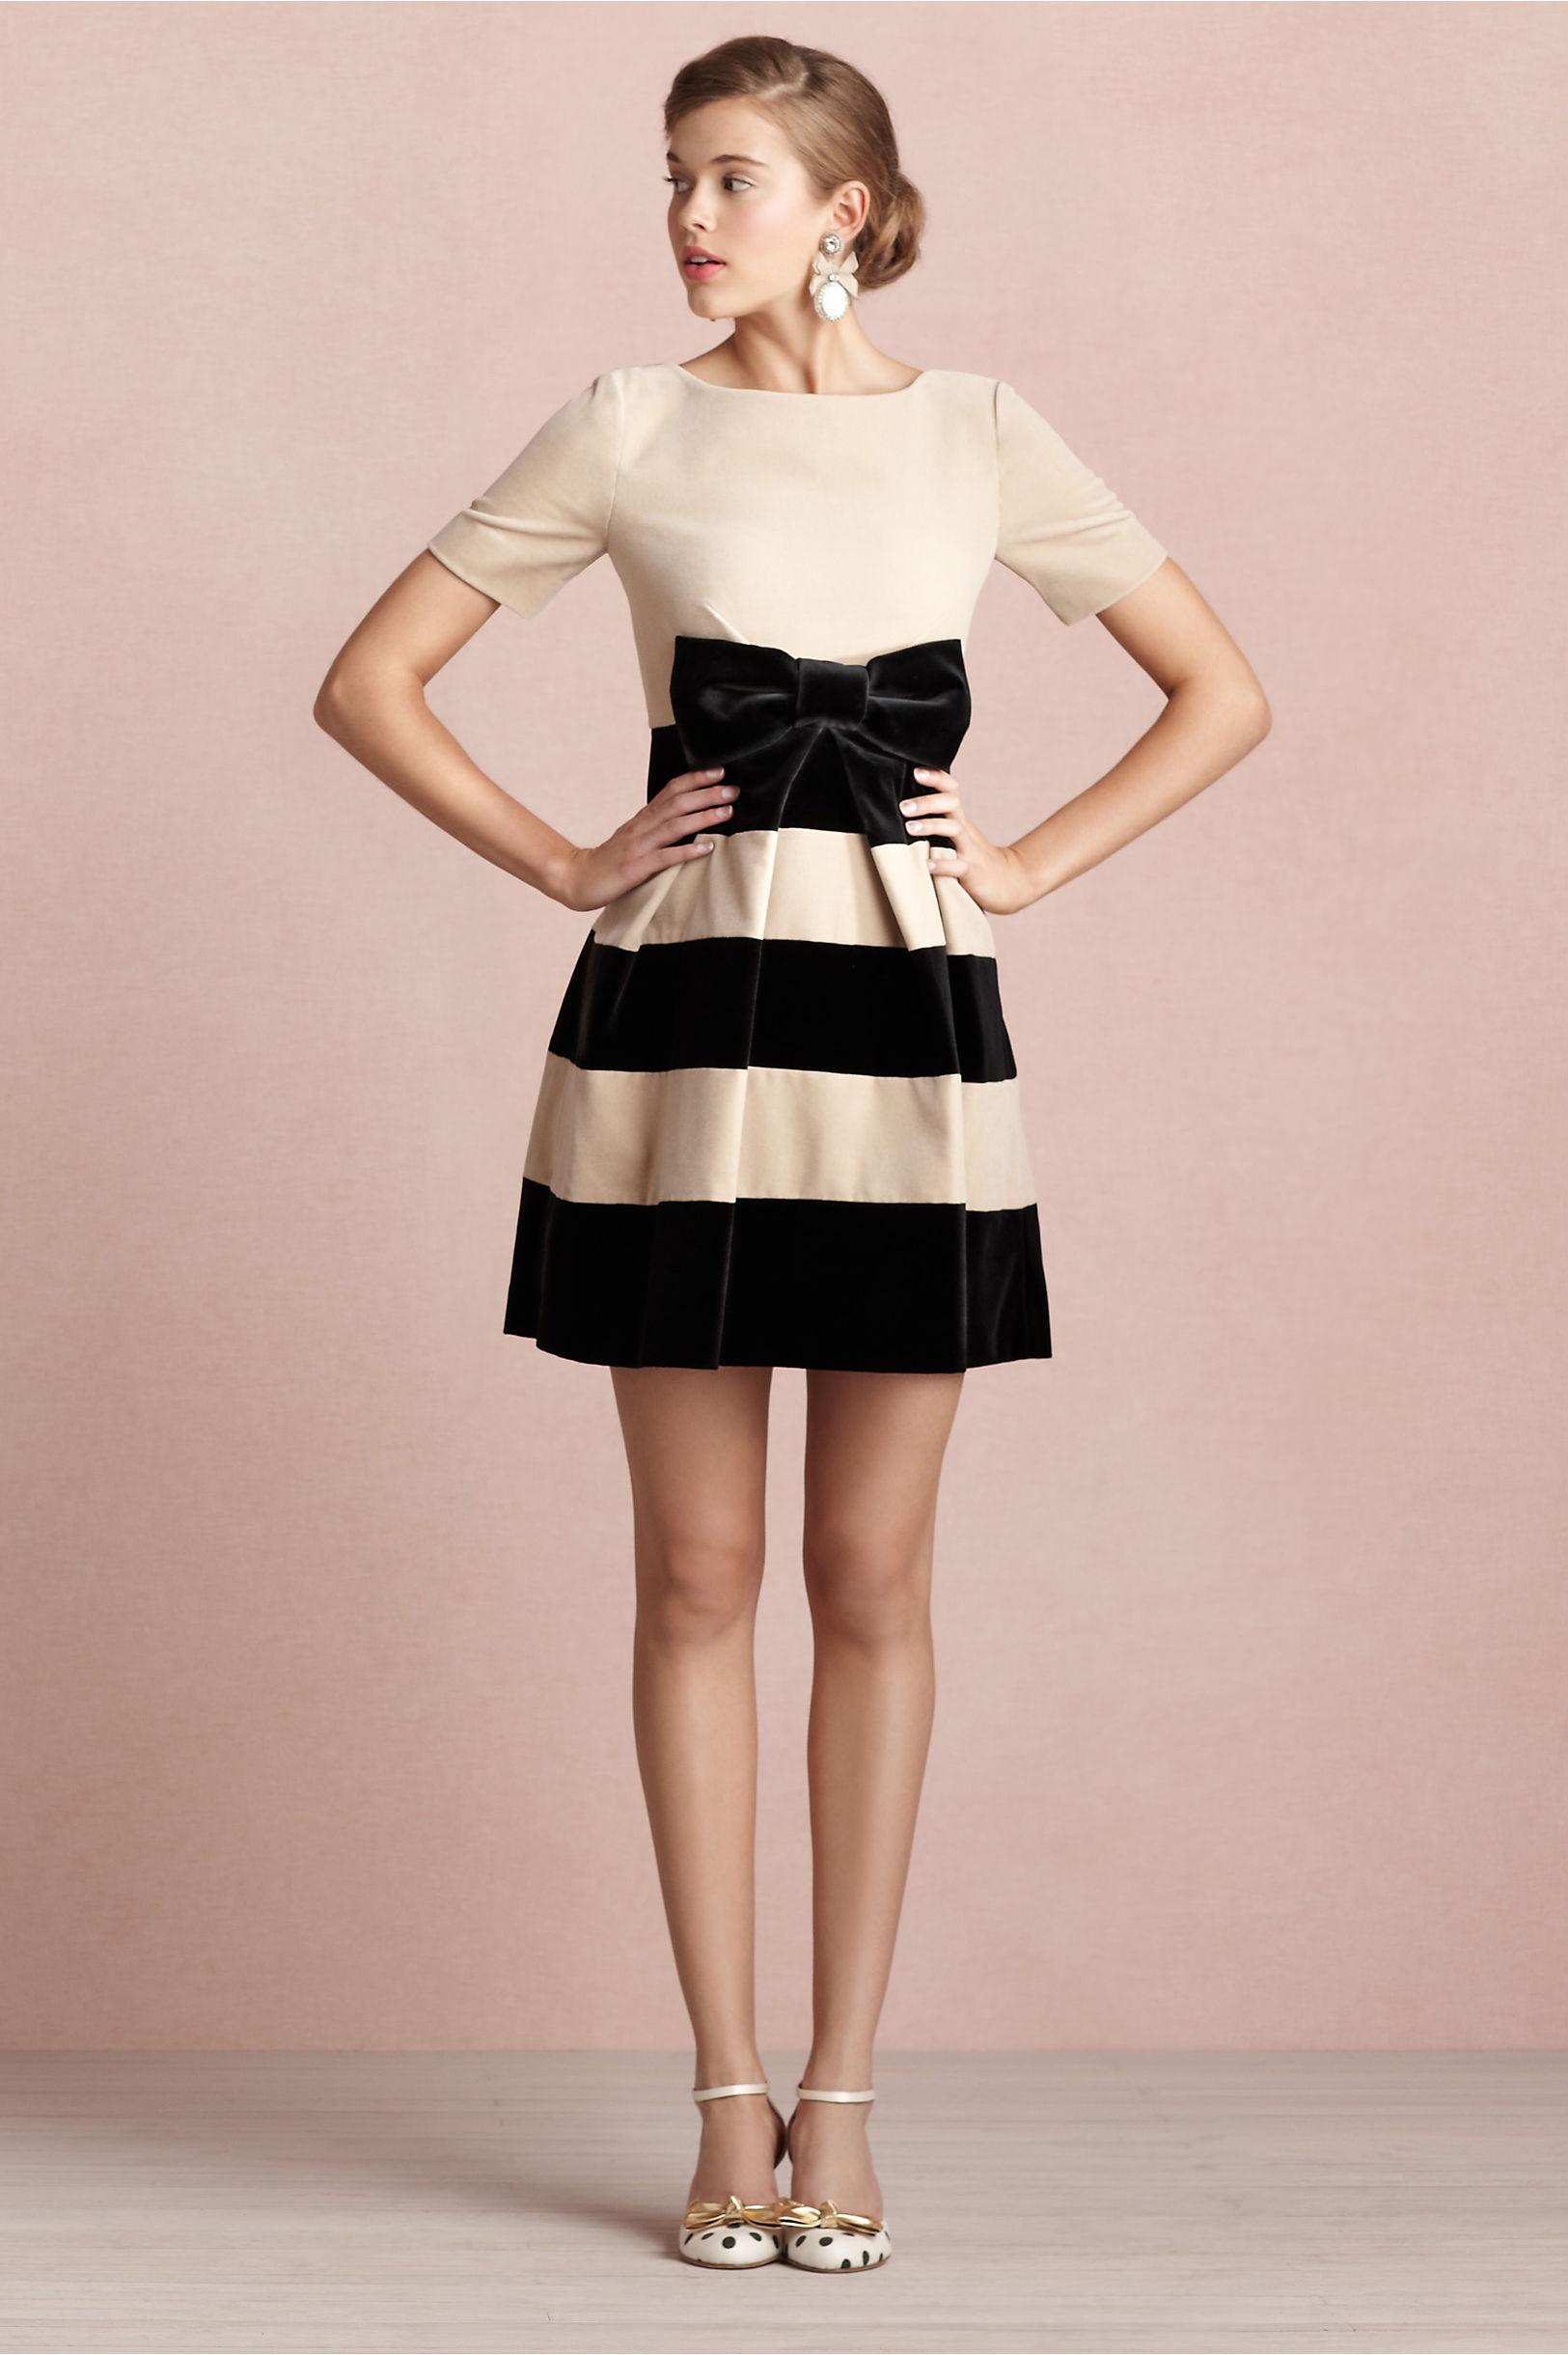 Regalia Dress in New & Noteworthy | BHLDN